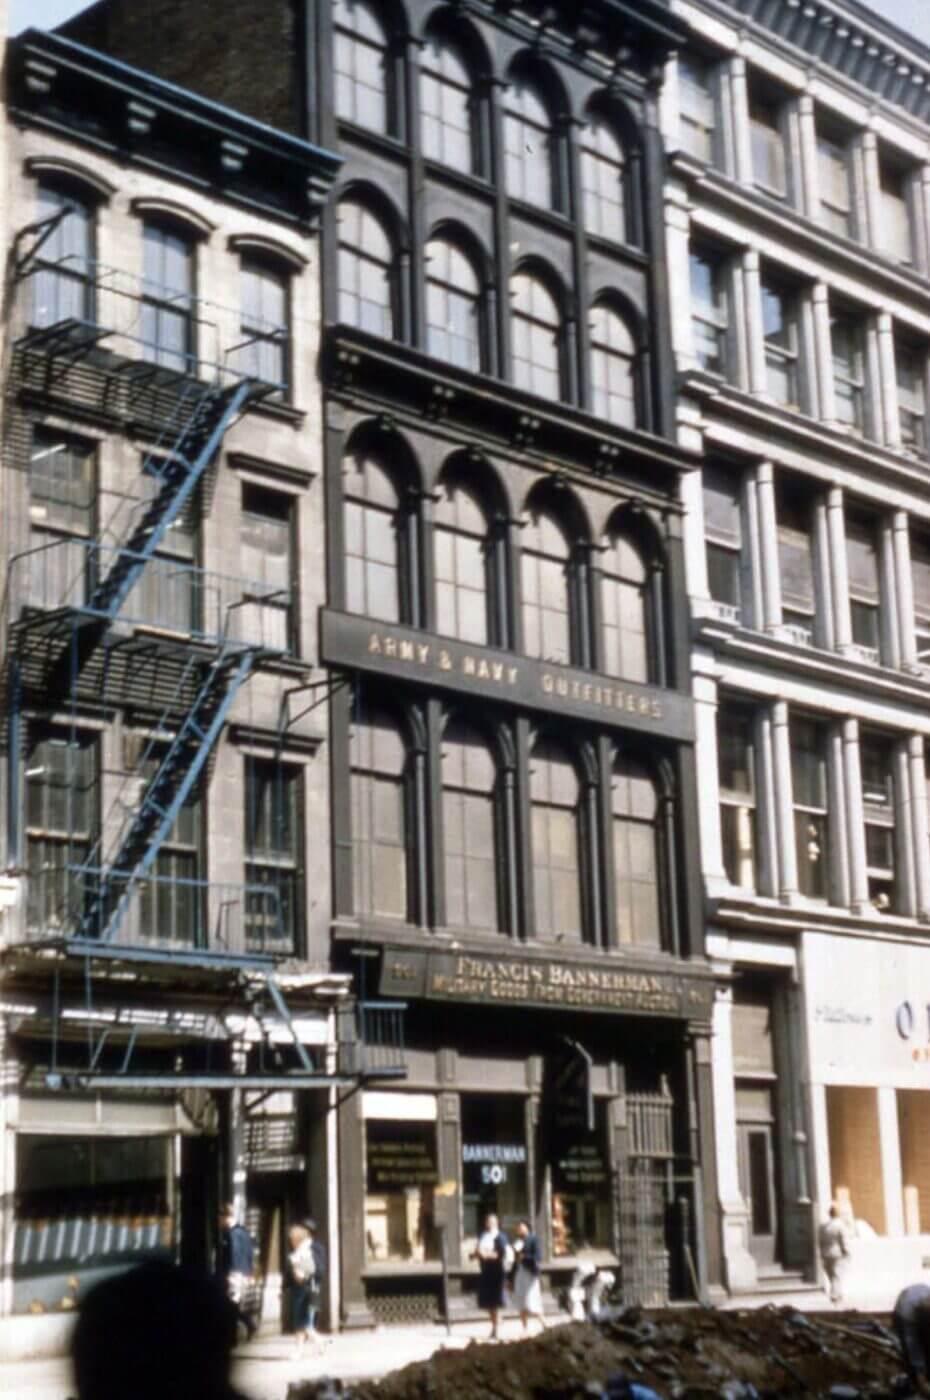 Bannerman Broadway milsurp store